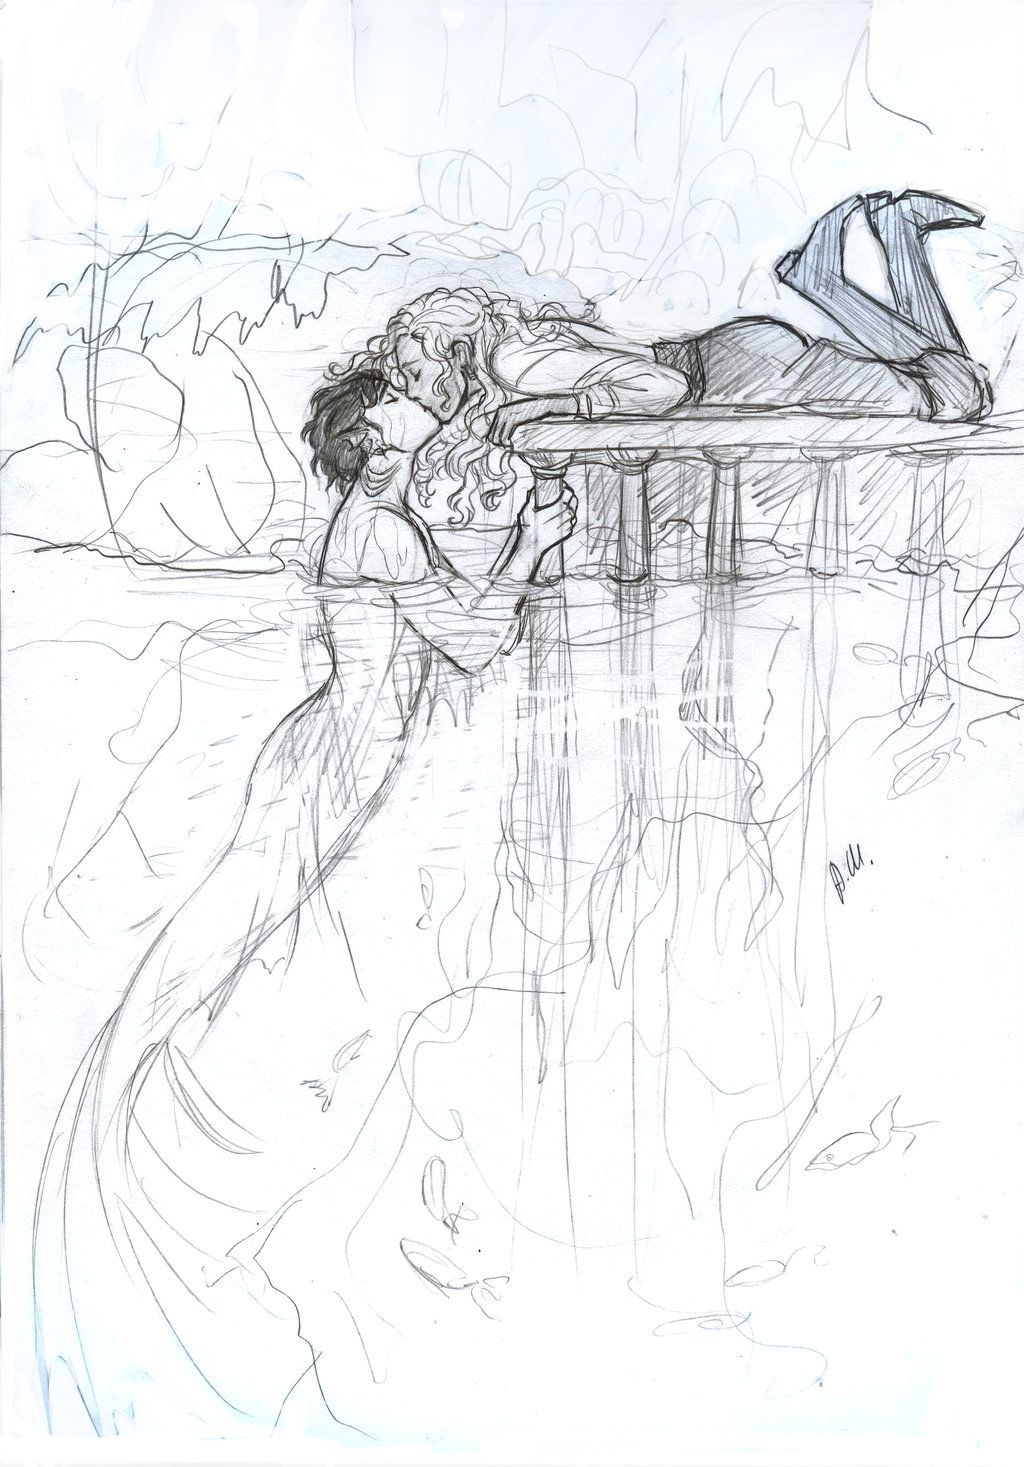 Persy and Annabeht by drakonarinka.deviantart.com on @deviantART